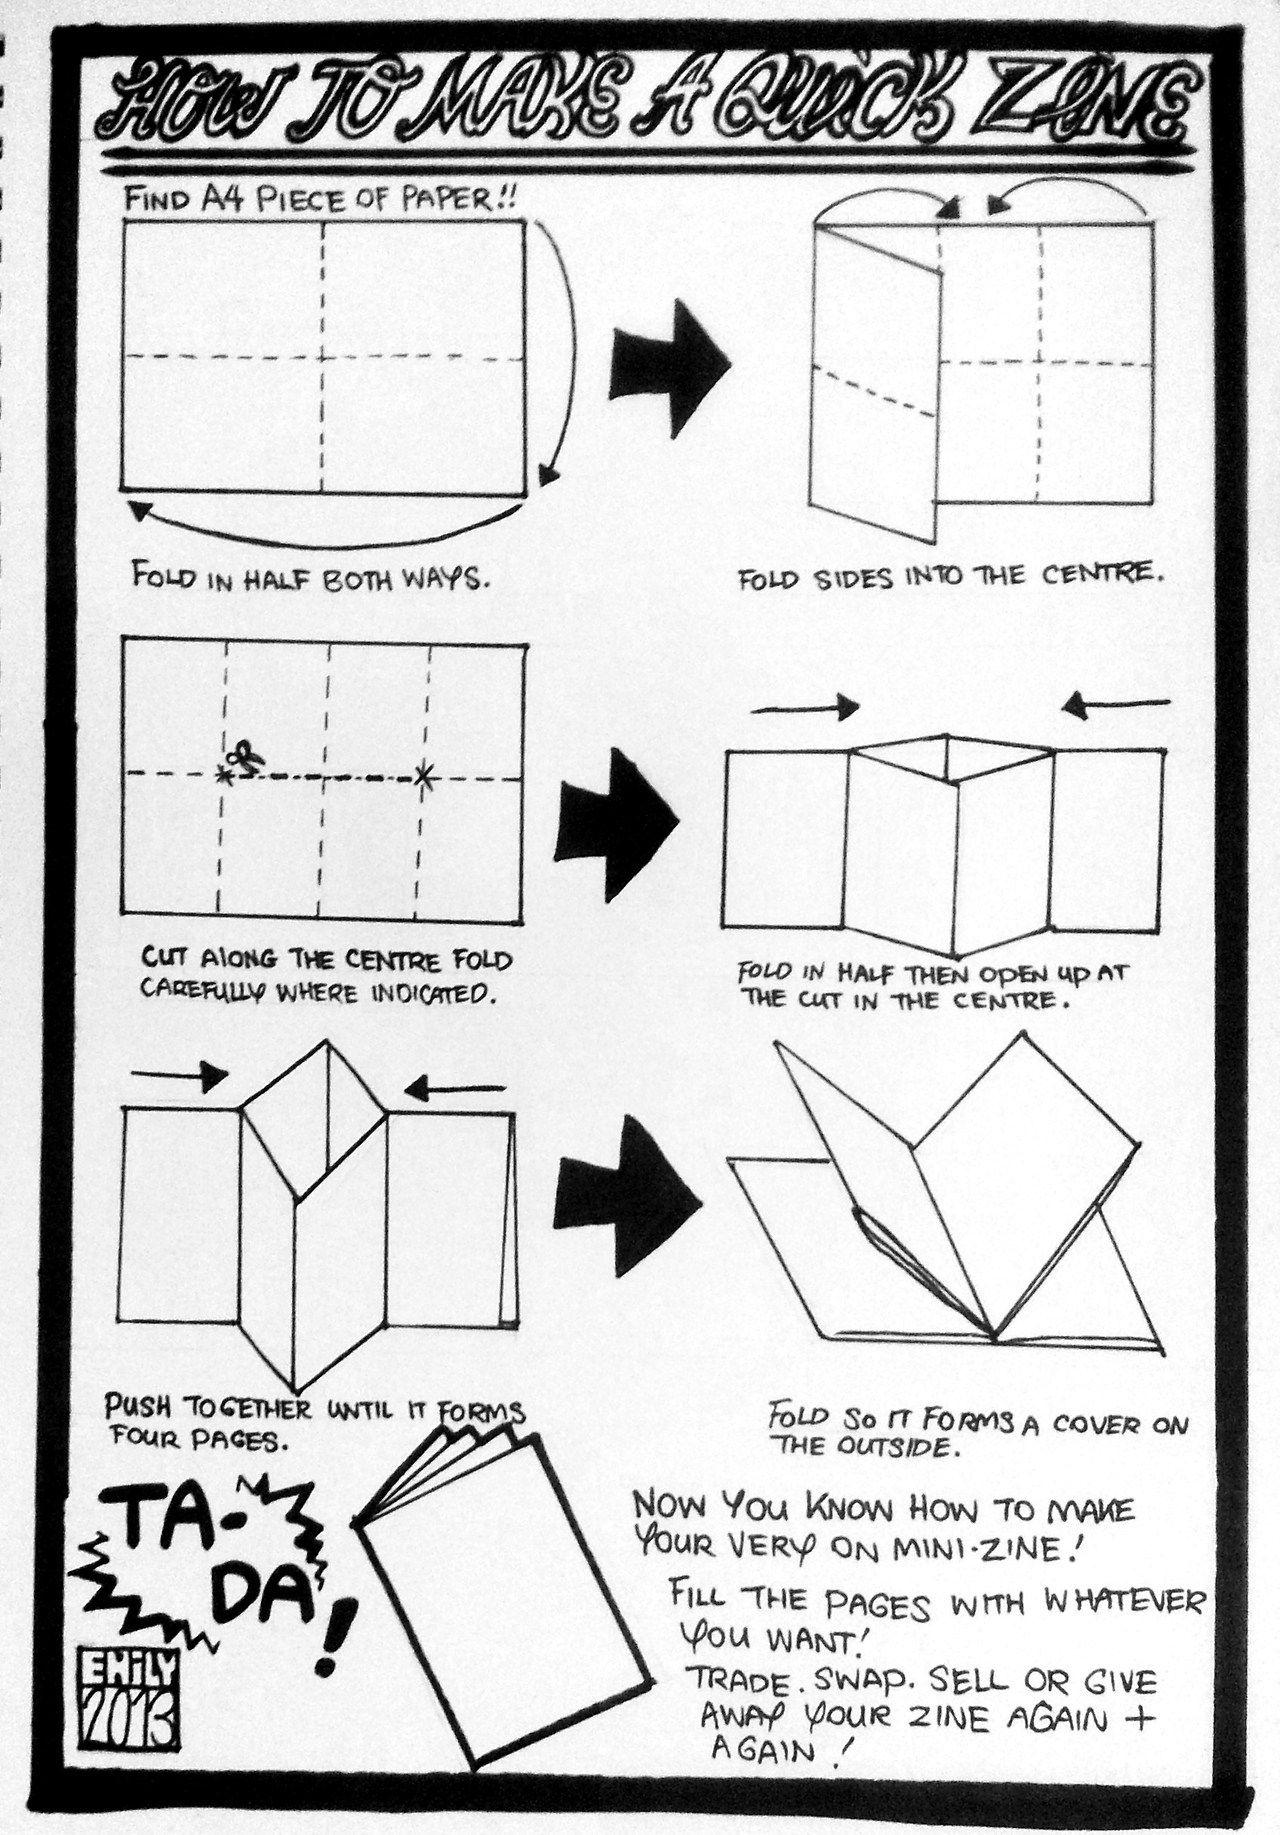 Flipe Munyuck How To Make A Quick Zine 1 Using An A4 Piece Of Paper Fold It In H